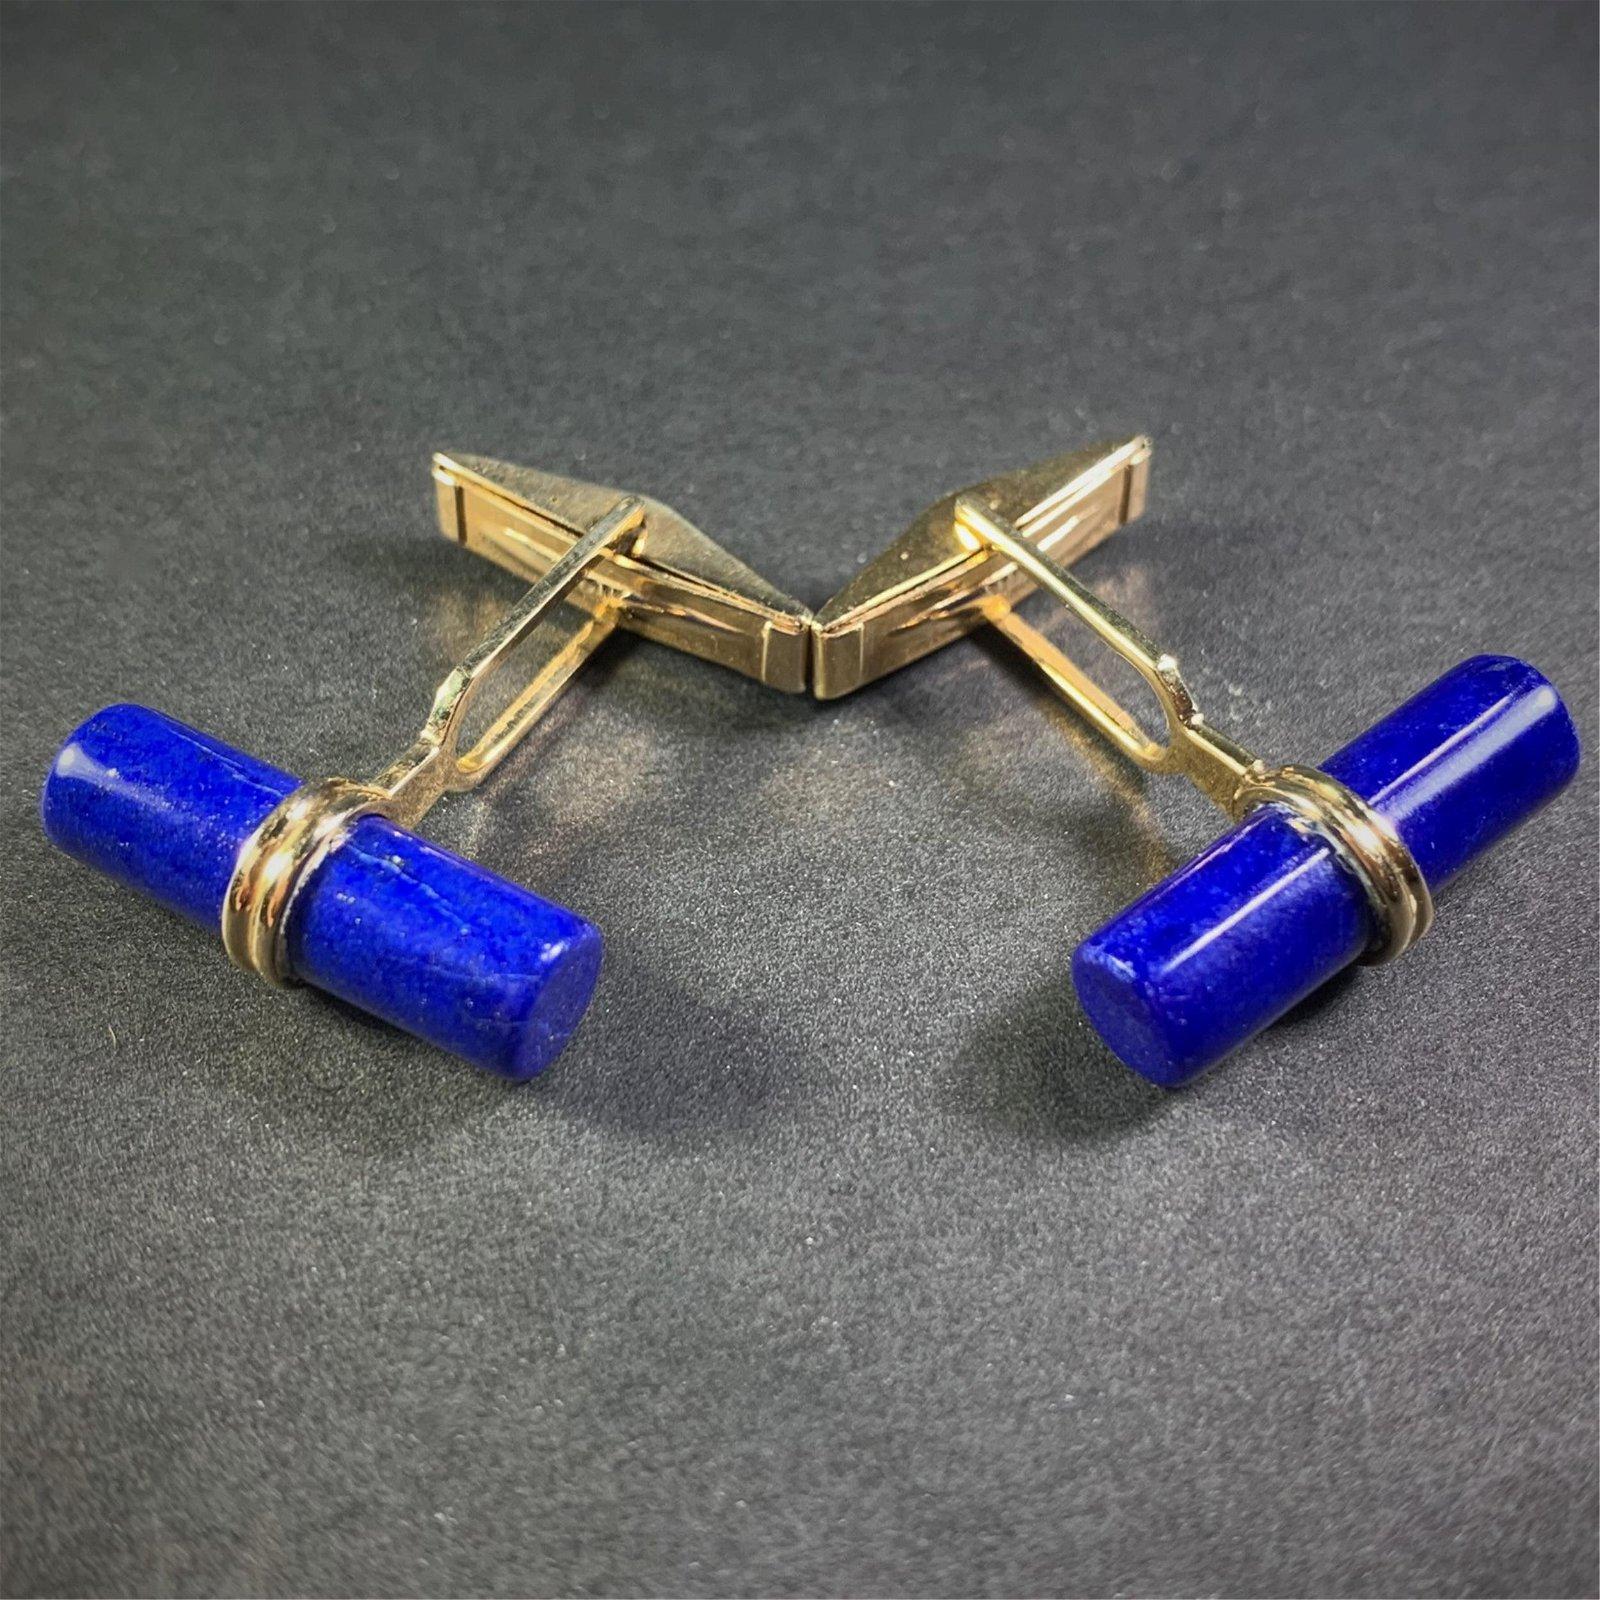 Pair Lapis Lazuli and 14K Yellow Gold Cufflinks. The